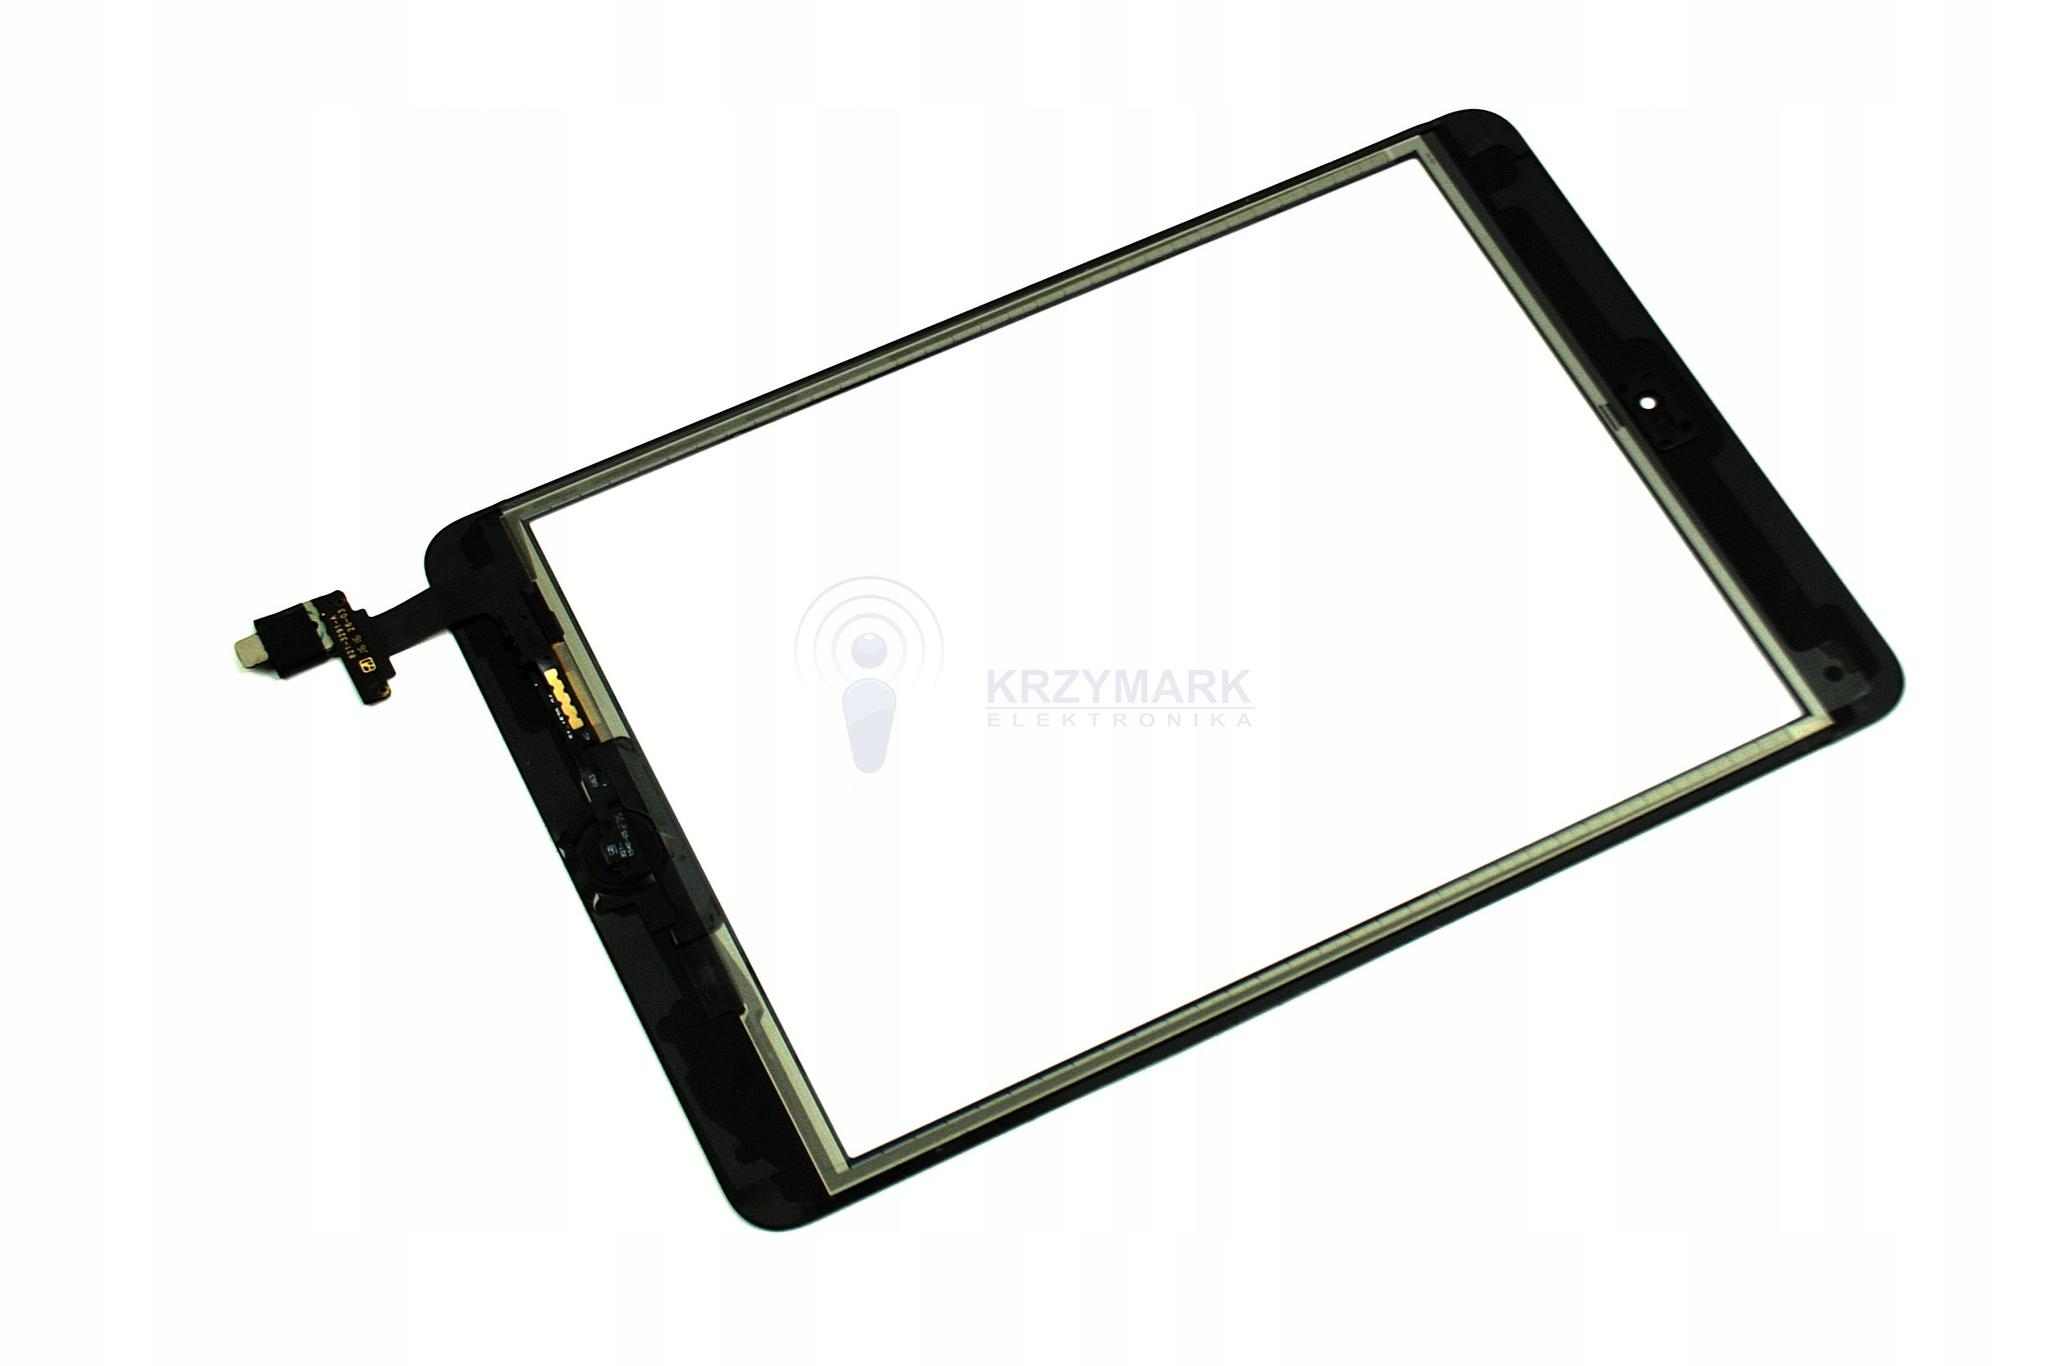 DIGITIZER EKRAN APPLE IPAD MINI 2 A1489 A1490 A1491 CZARNY - Digitizery do tabletów